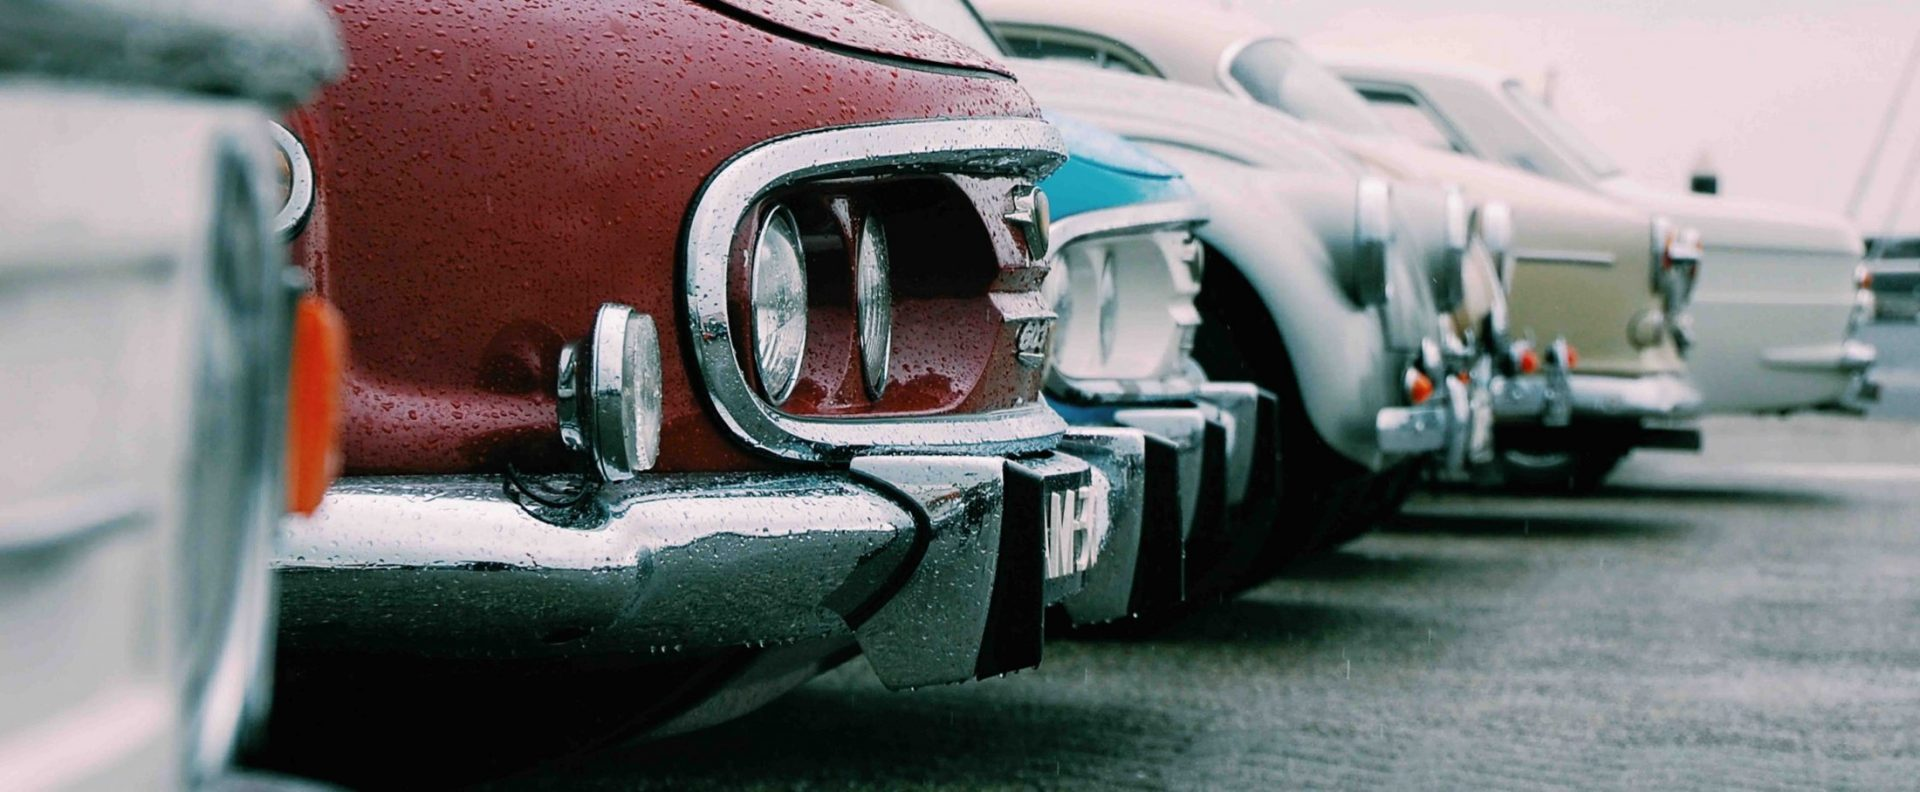 Car Parking | The Haymarket Hub Hotel in Edinburgh Scotland